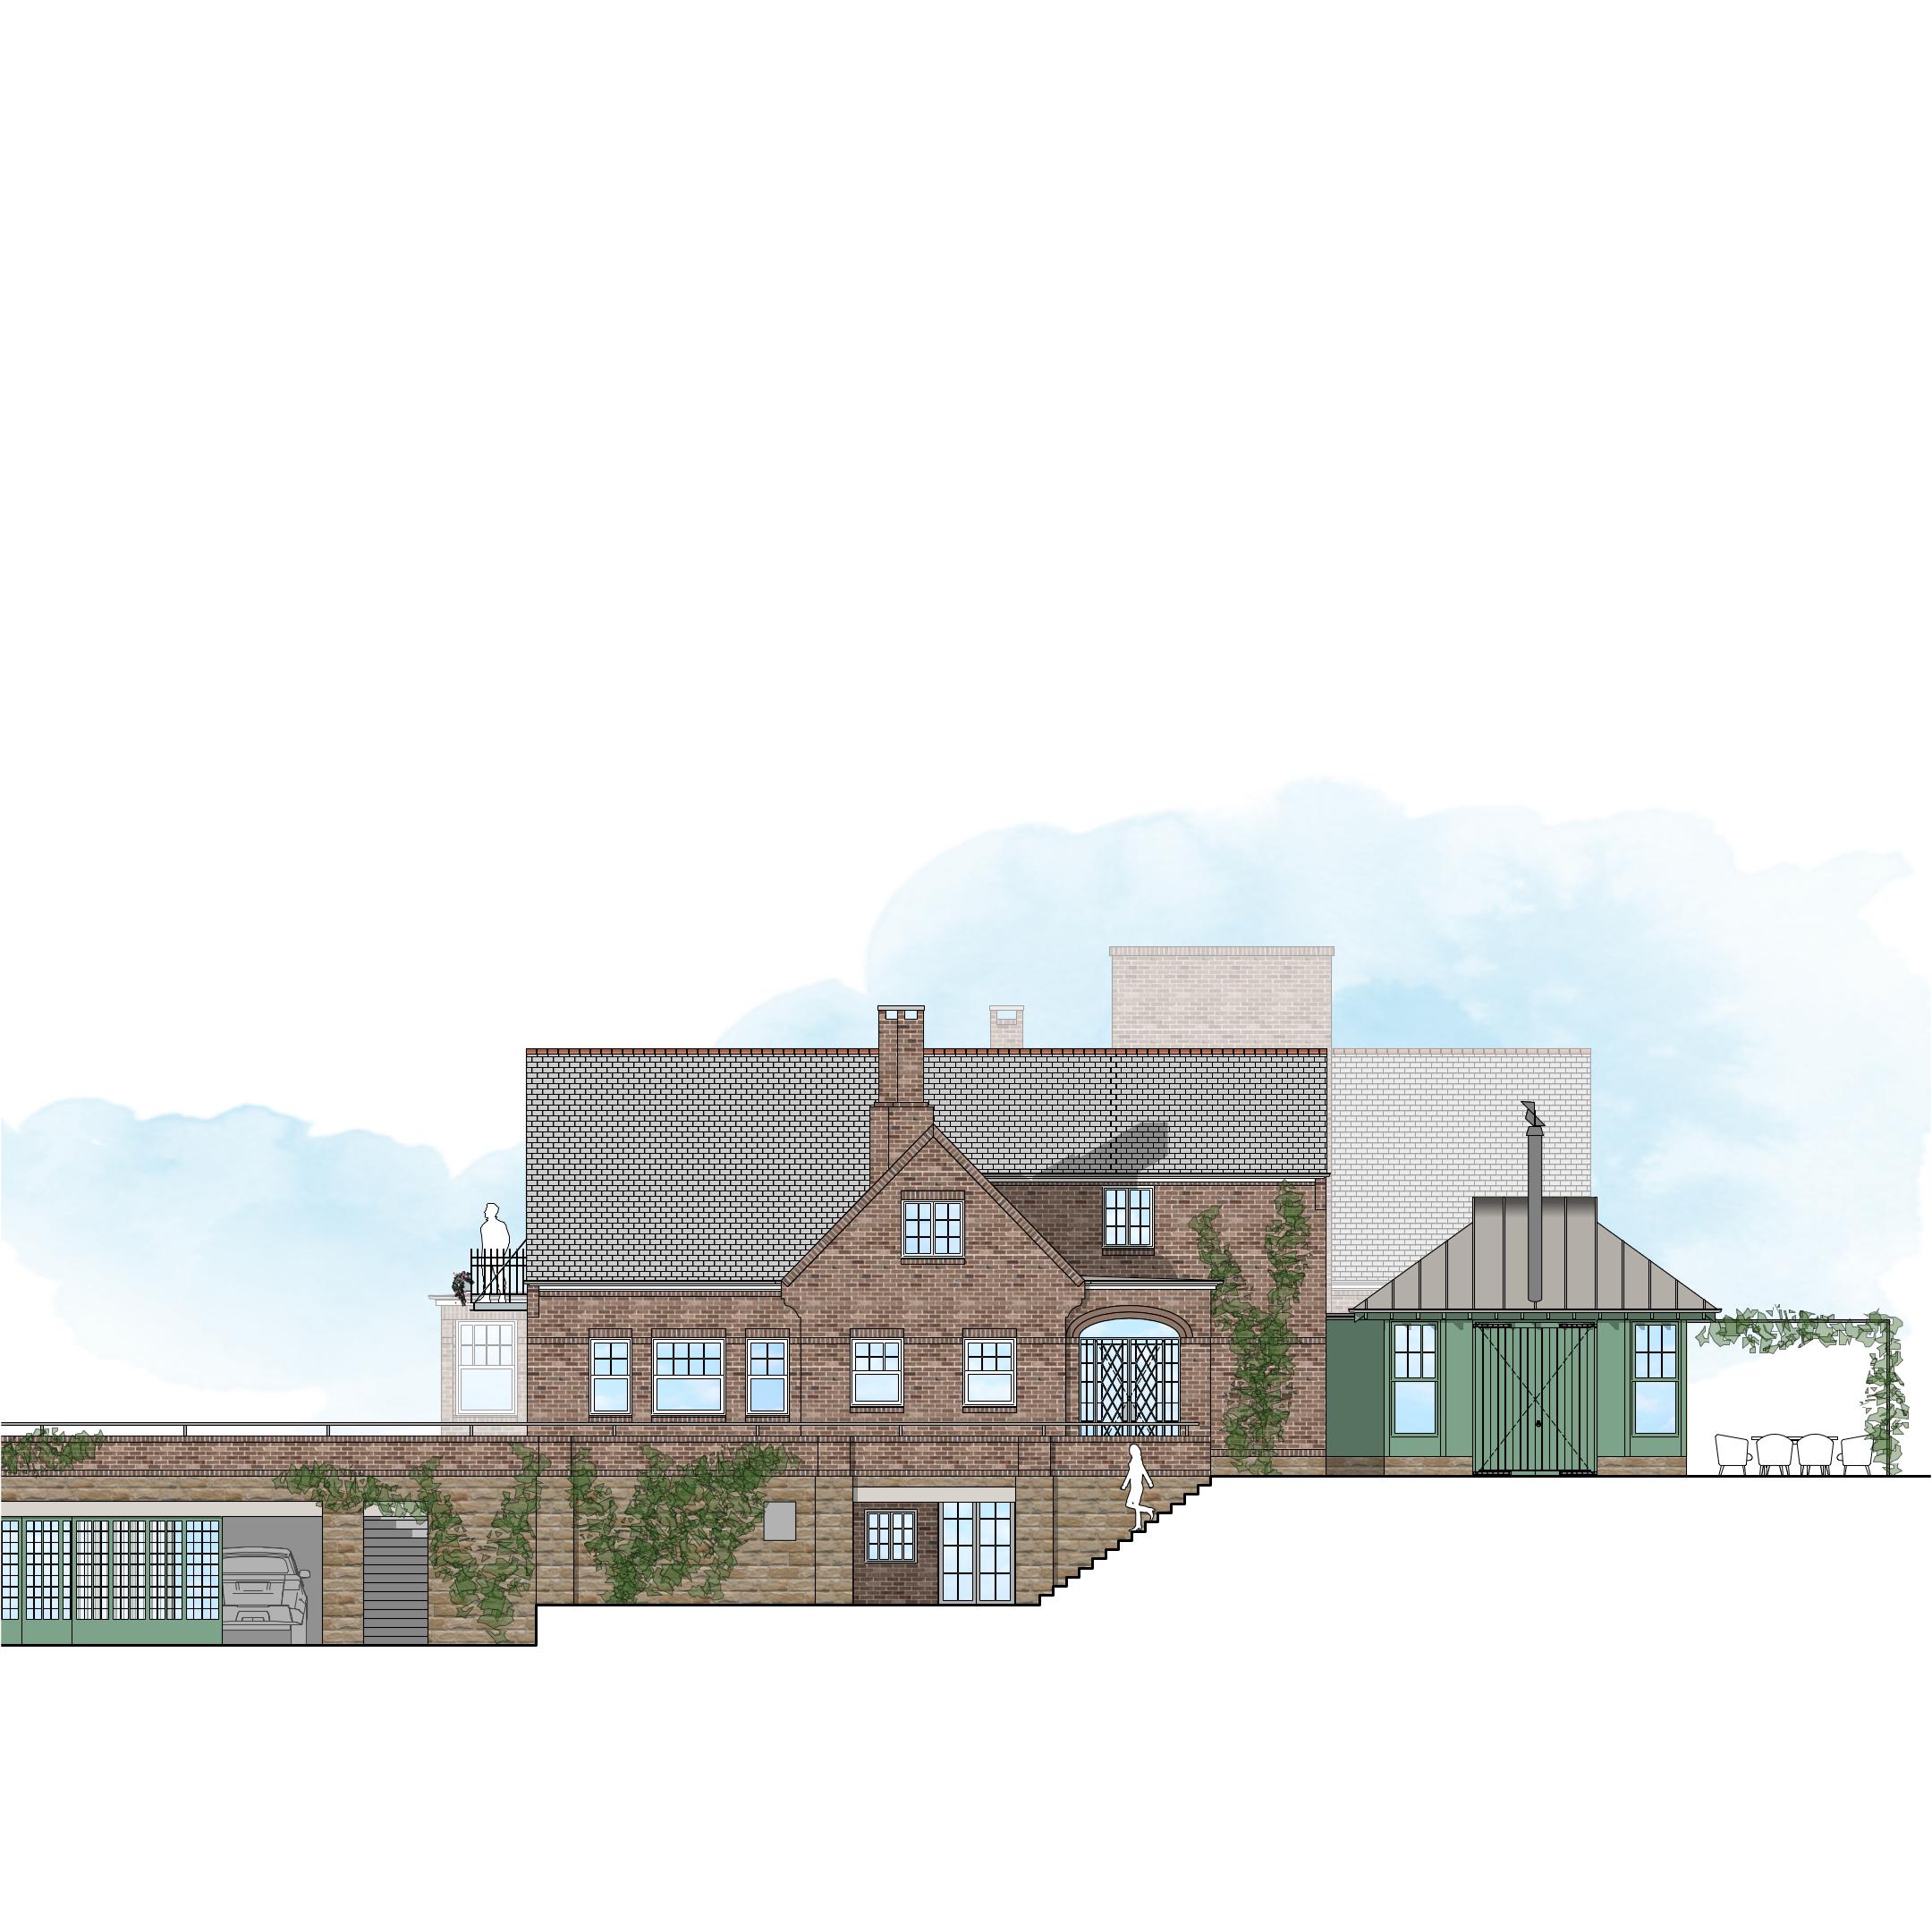 James Allen Architect Grasemere House 2.jpg